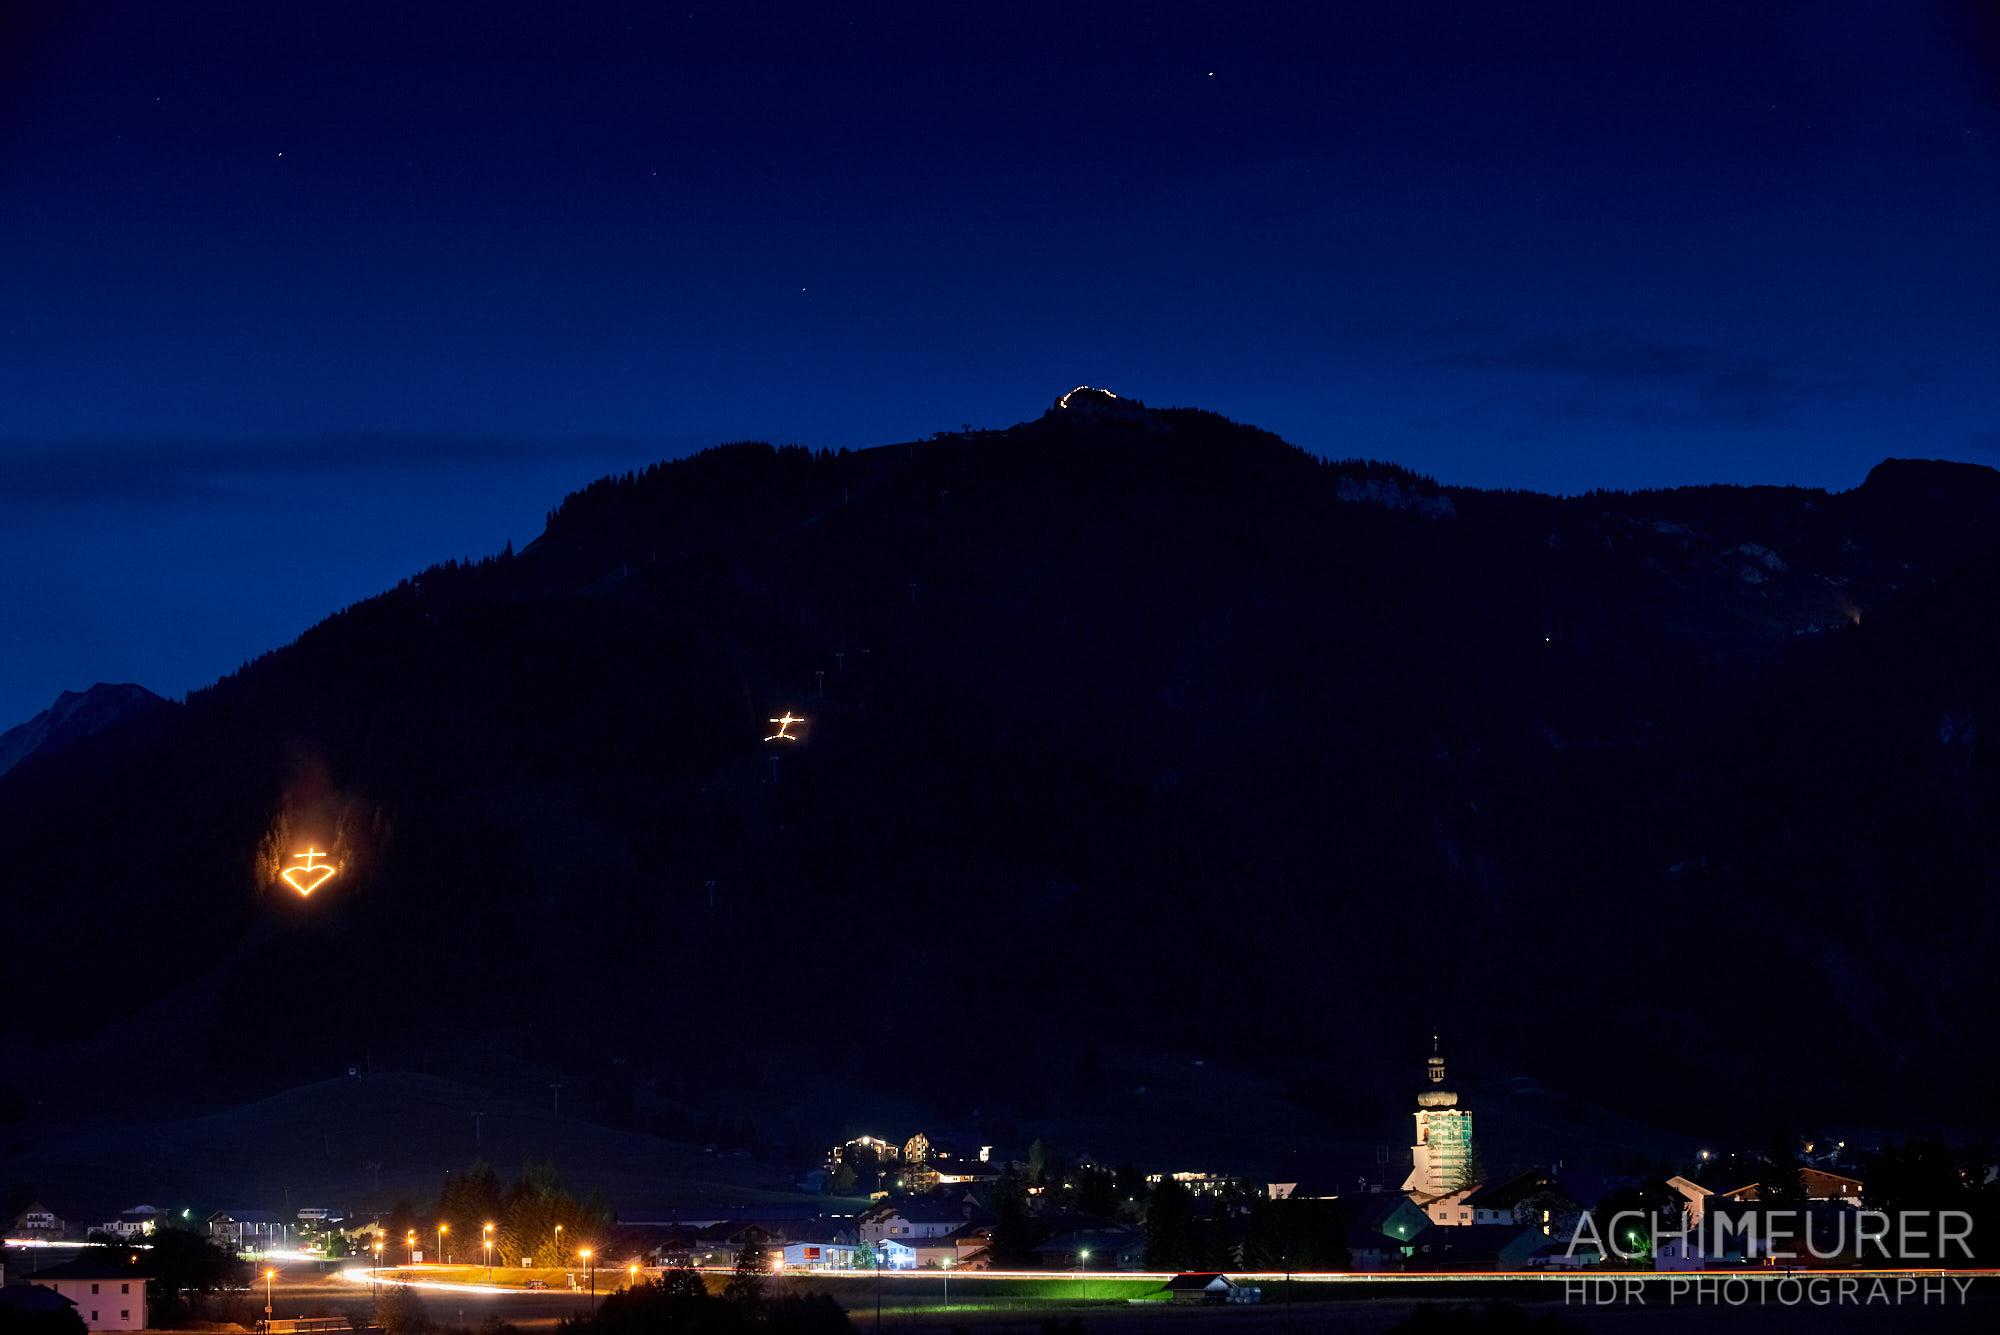 Herz-Jesu-Feuer Tannheimer Tal, Tirol, Österreich by AchimMeurer.com.